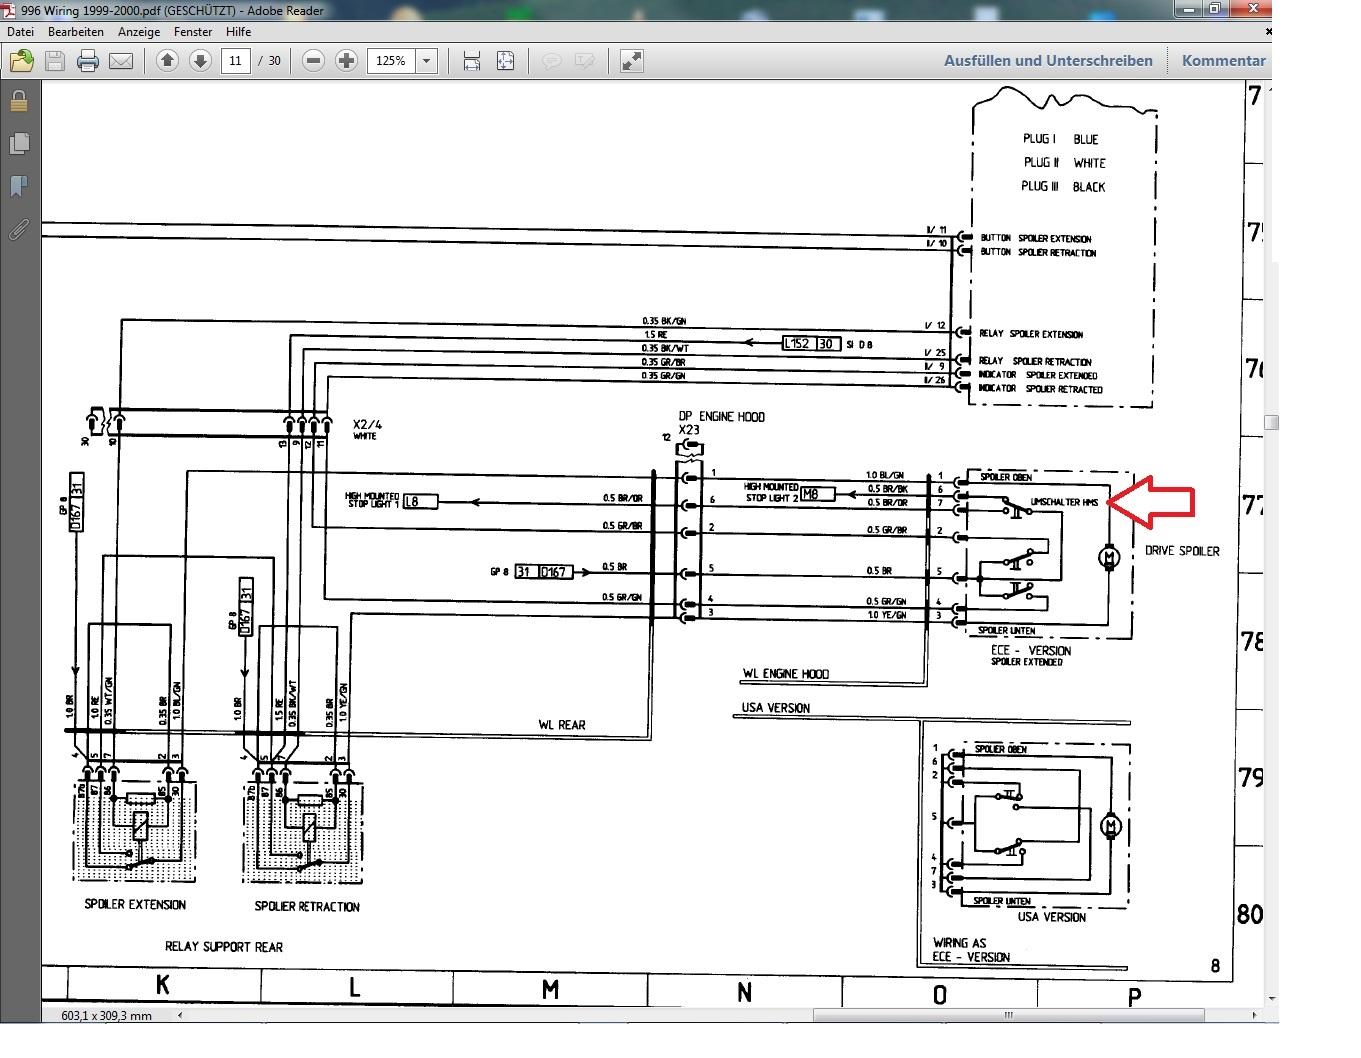 Ey 2846 Wiring Diagram Mitsubishi Pajero 1990 Schematic Wiring